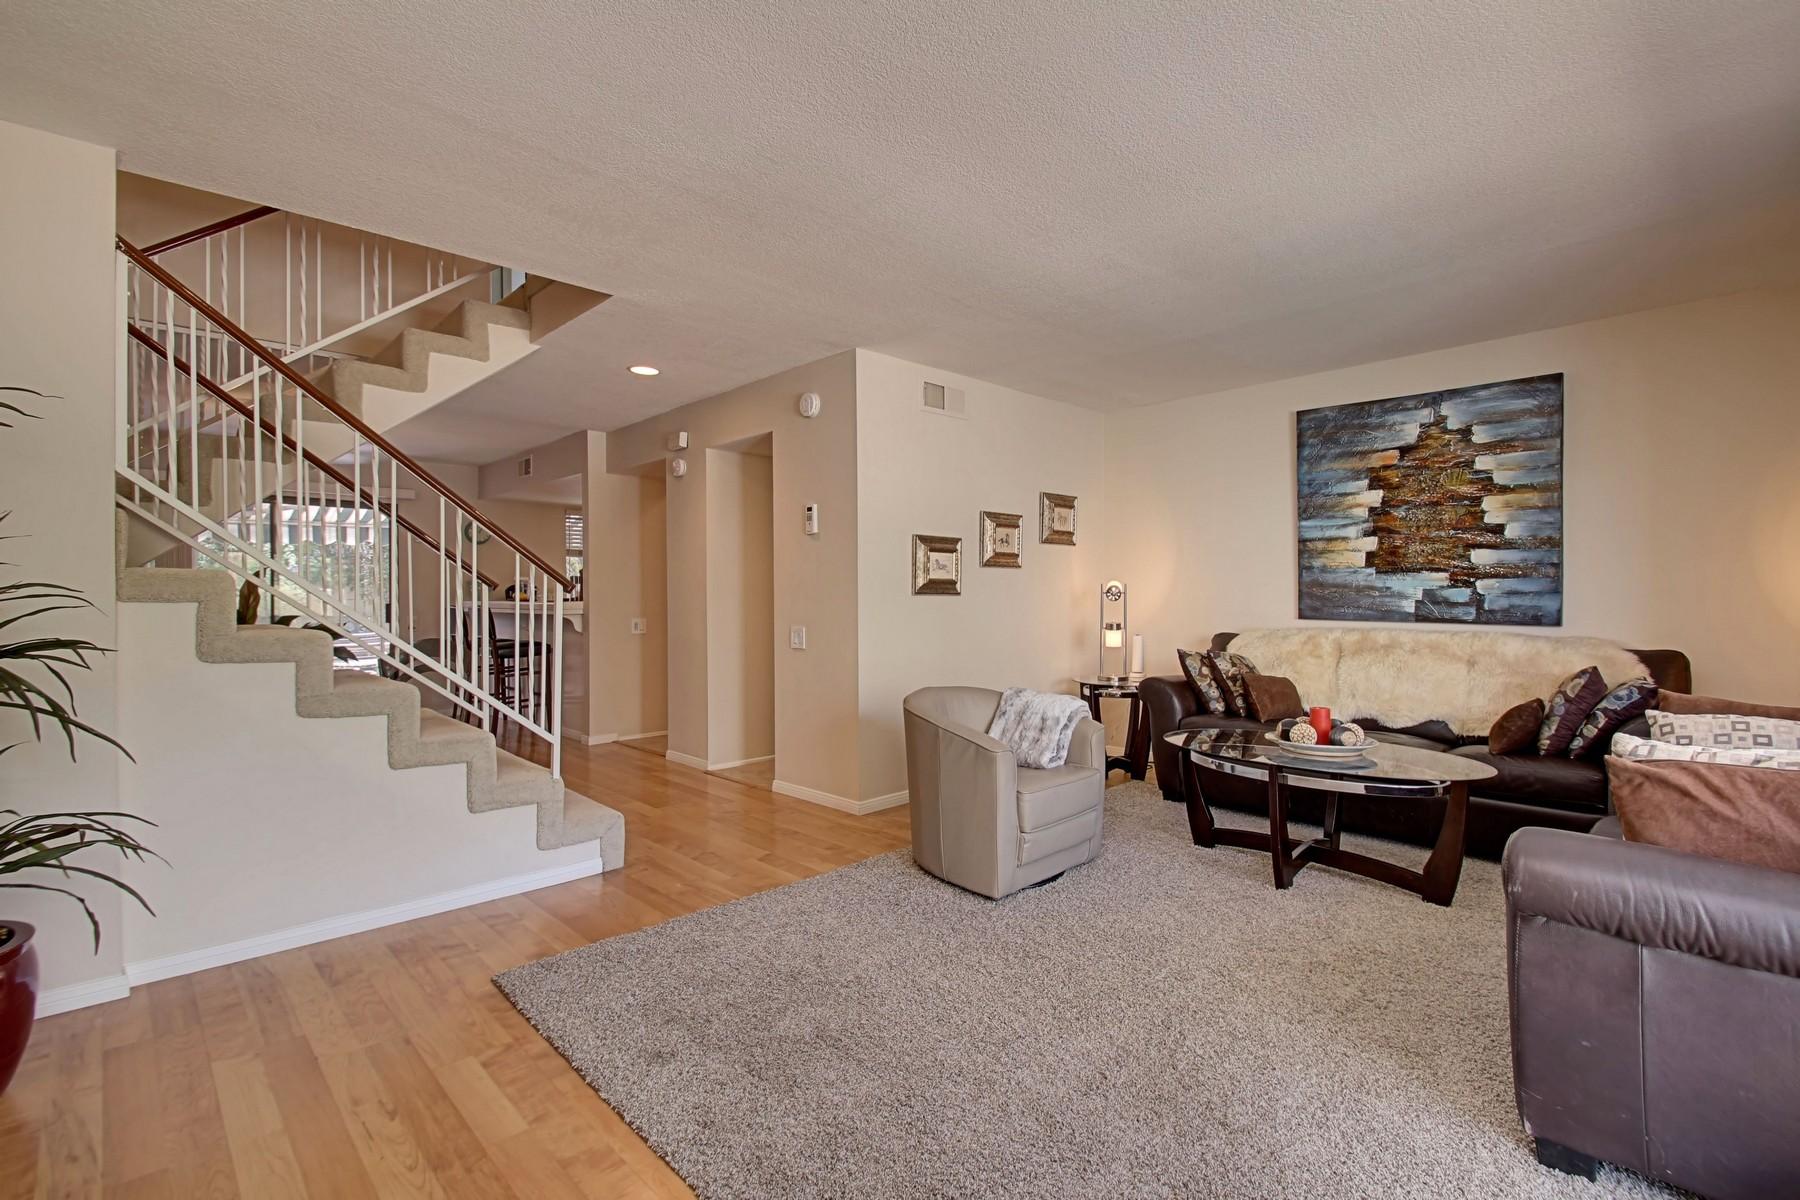 Condominium for Sale at 411 West Arenas Road No. 10 Palm Springs, California 92262 United States